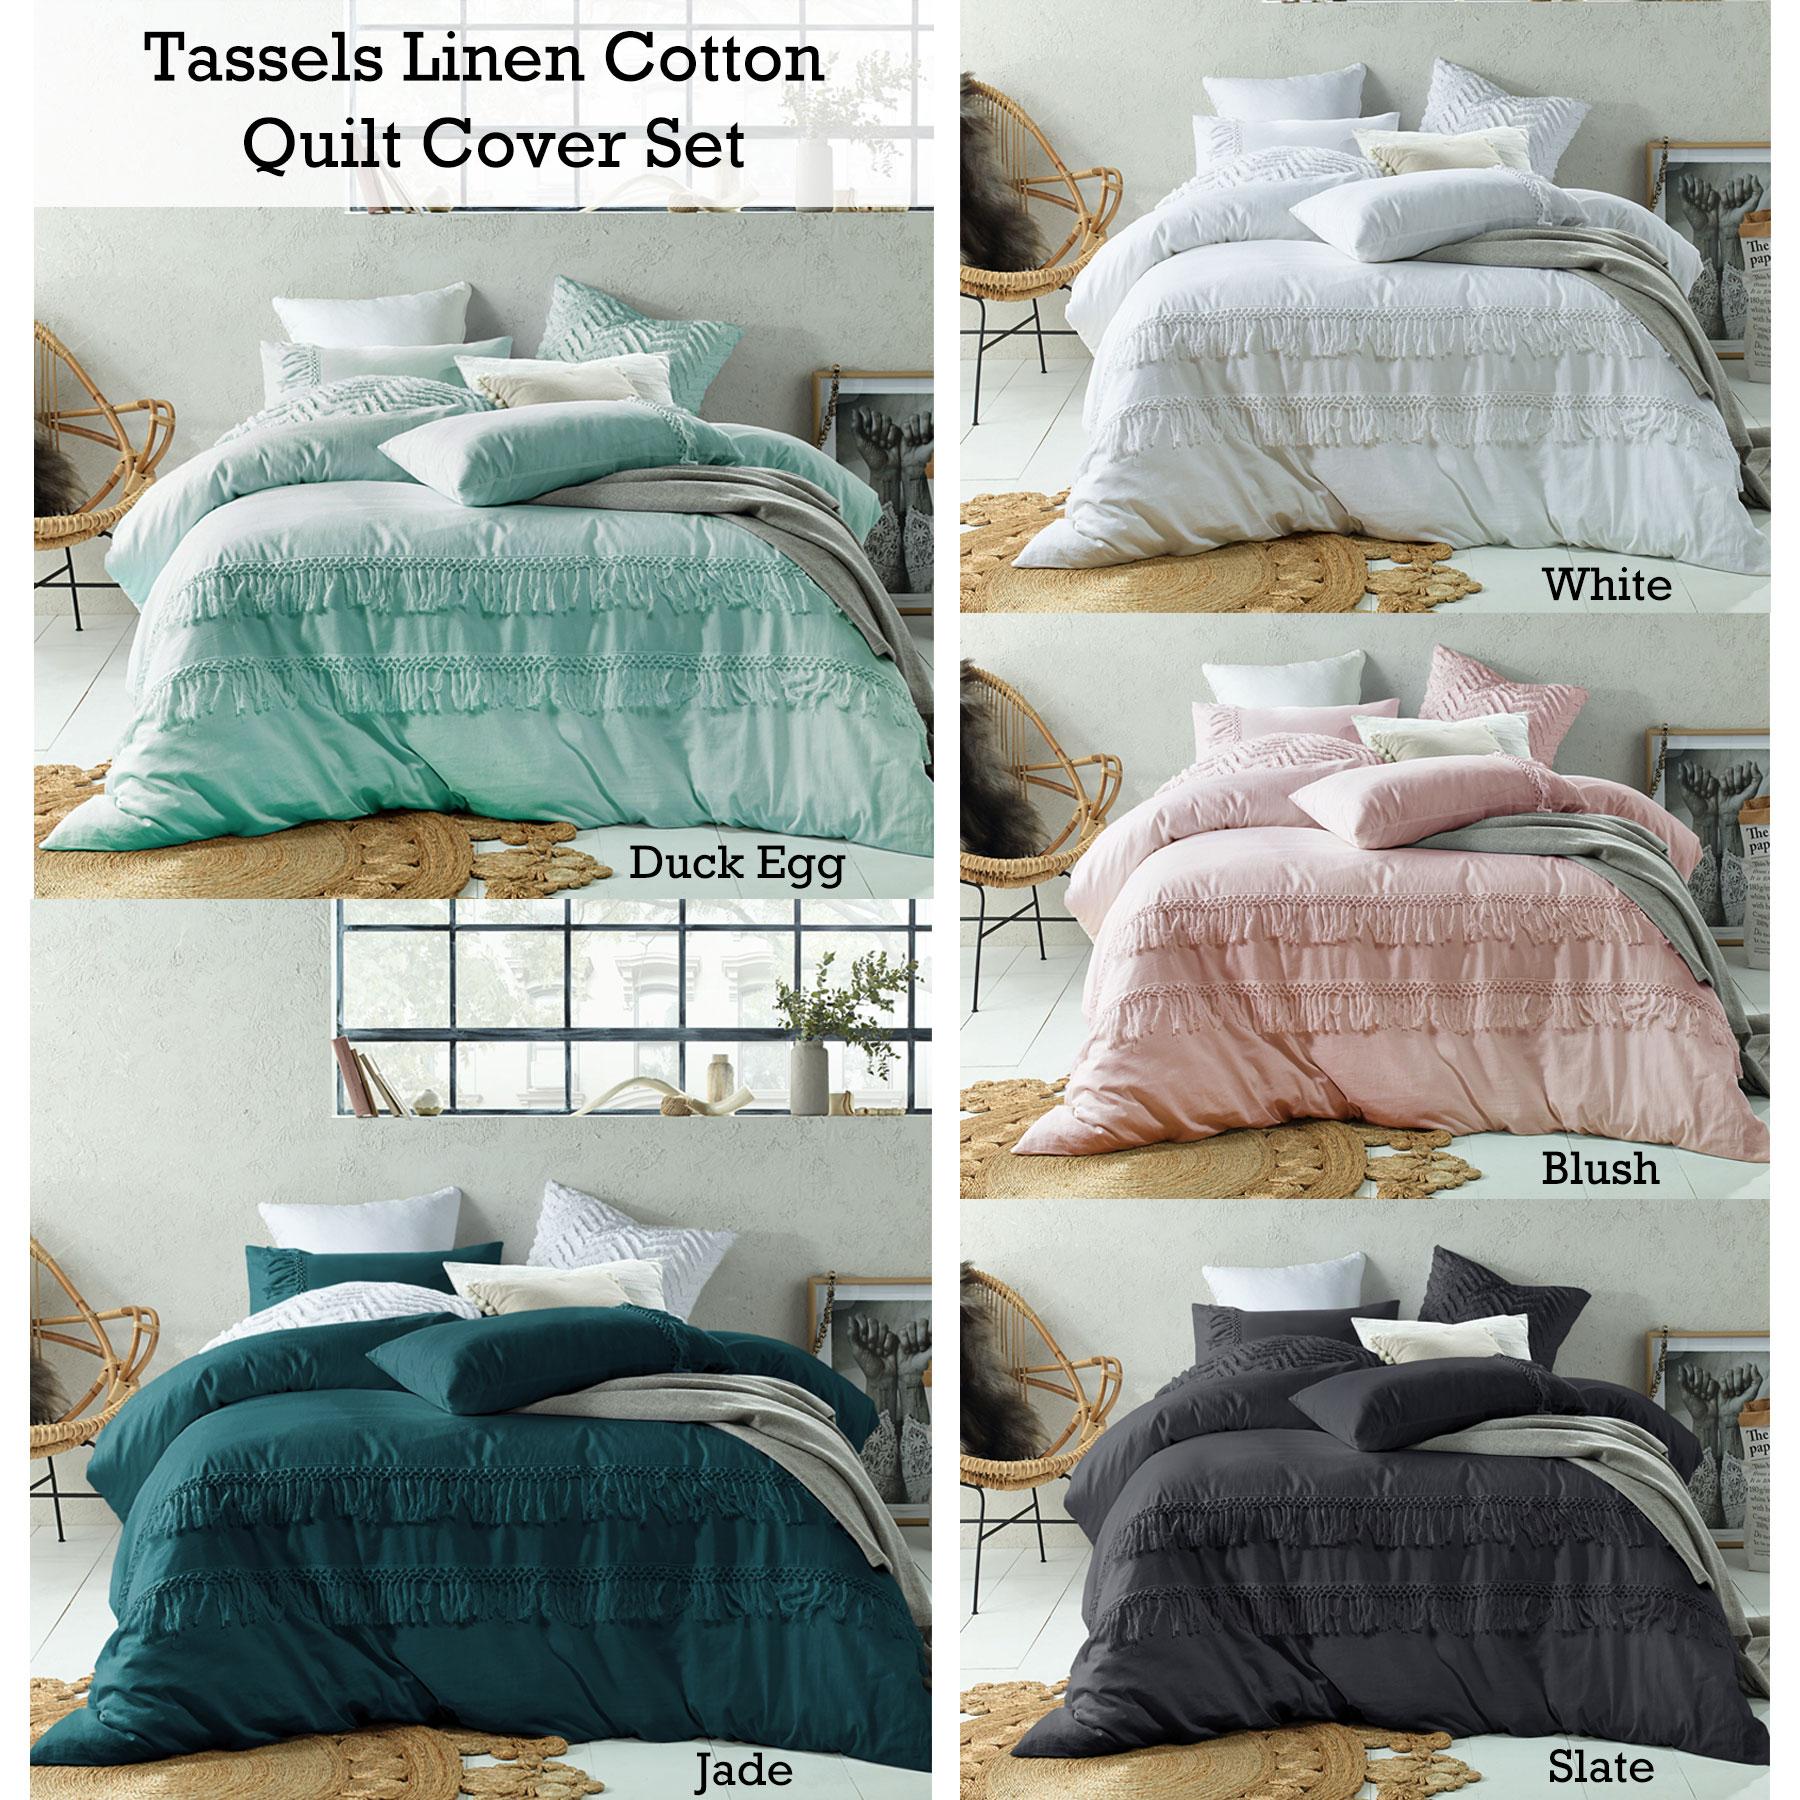 Tassel Linen Cotton Quilt Duvet Doona Cover Set Double Queen King Super King Ebay